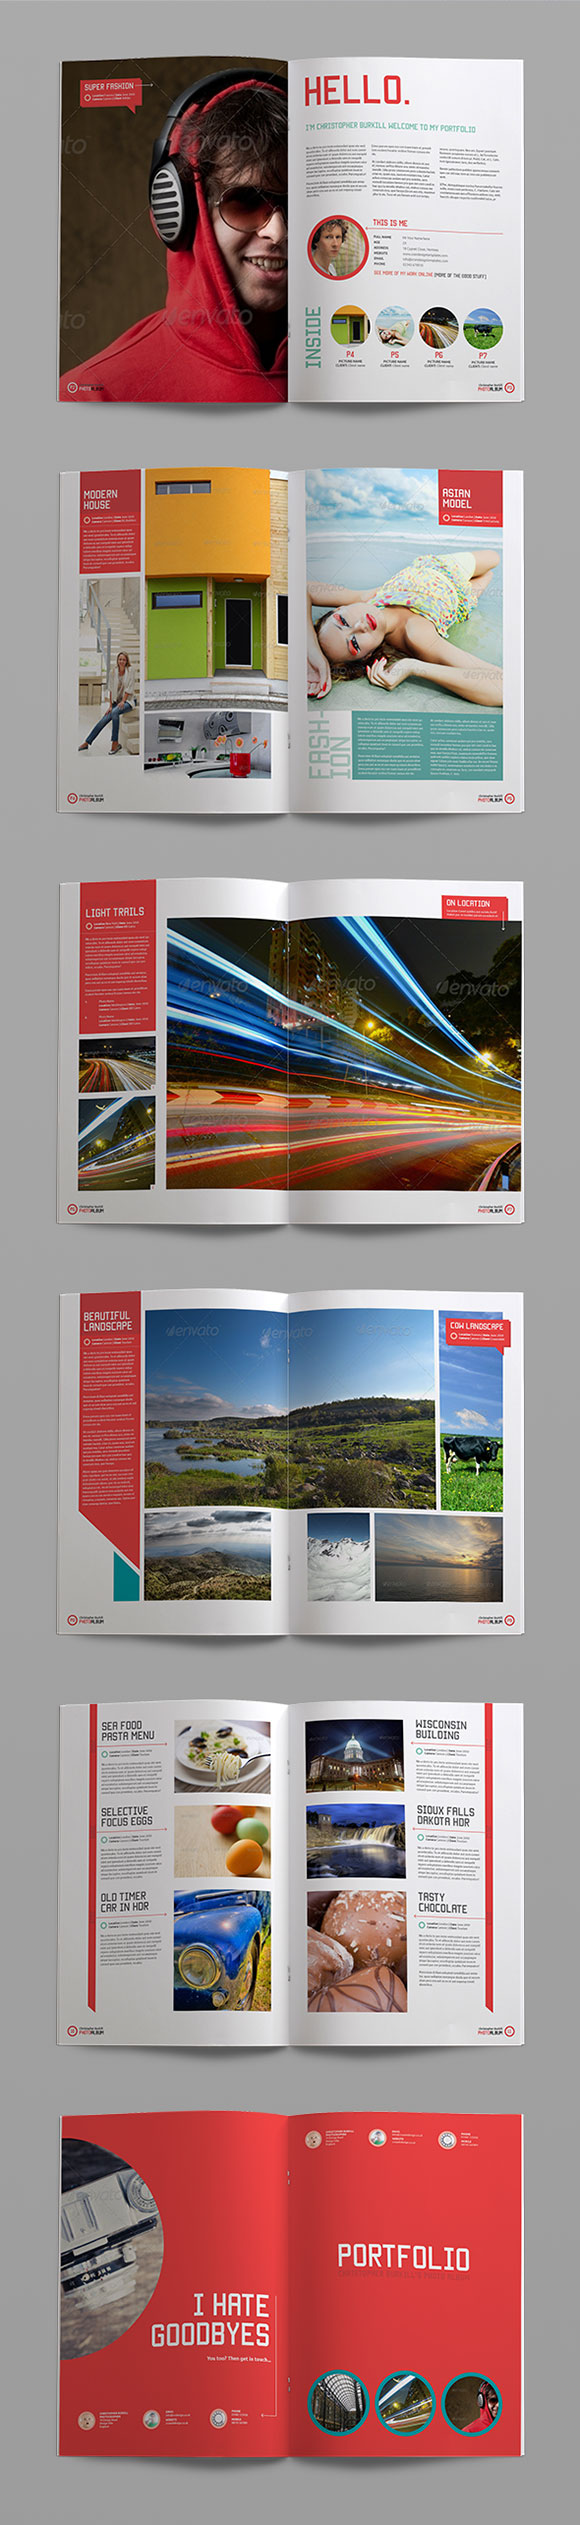 Sleek photo album indesign portfolio template crs indesign templates for Indesign portfolio template free